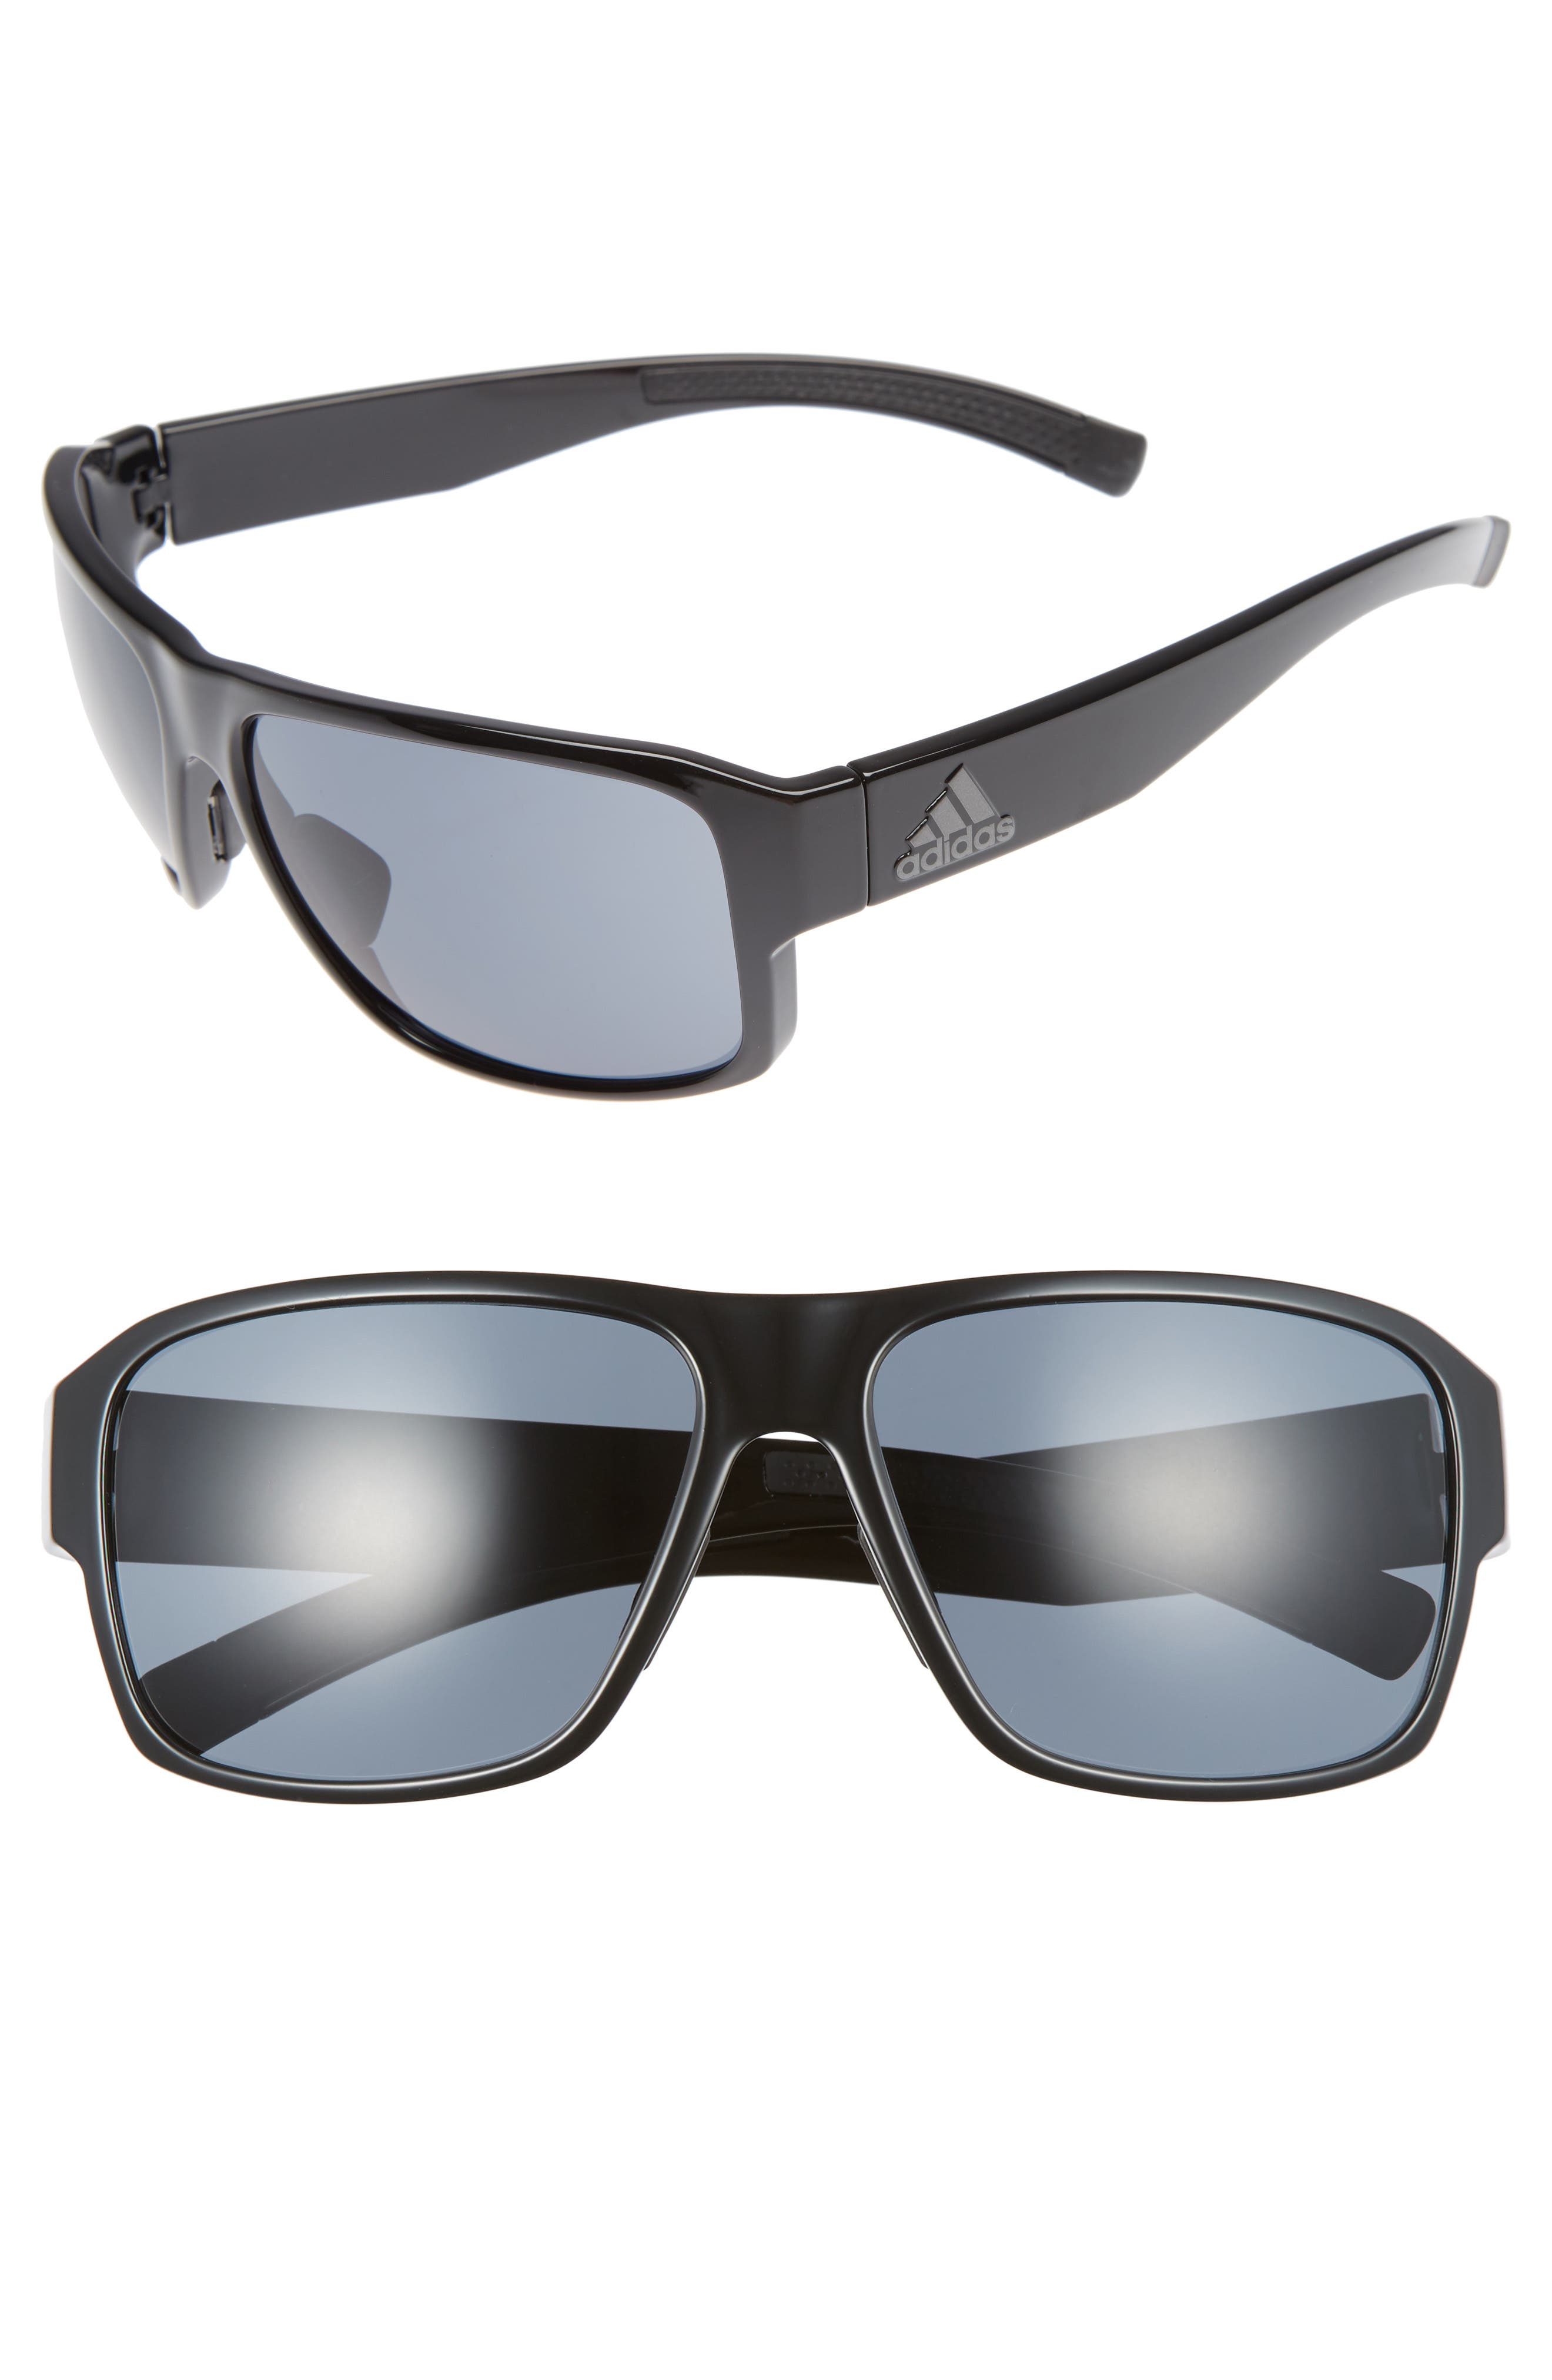 Jaysor 60mm Sunglasses,                             Main thumbnail 1, color,                             001